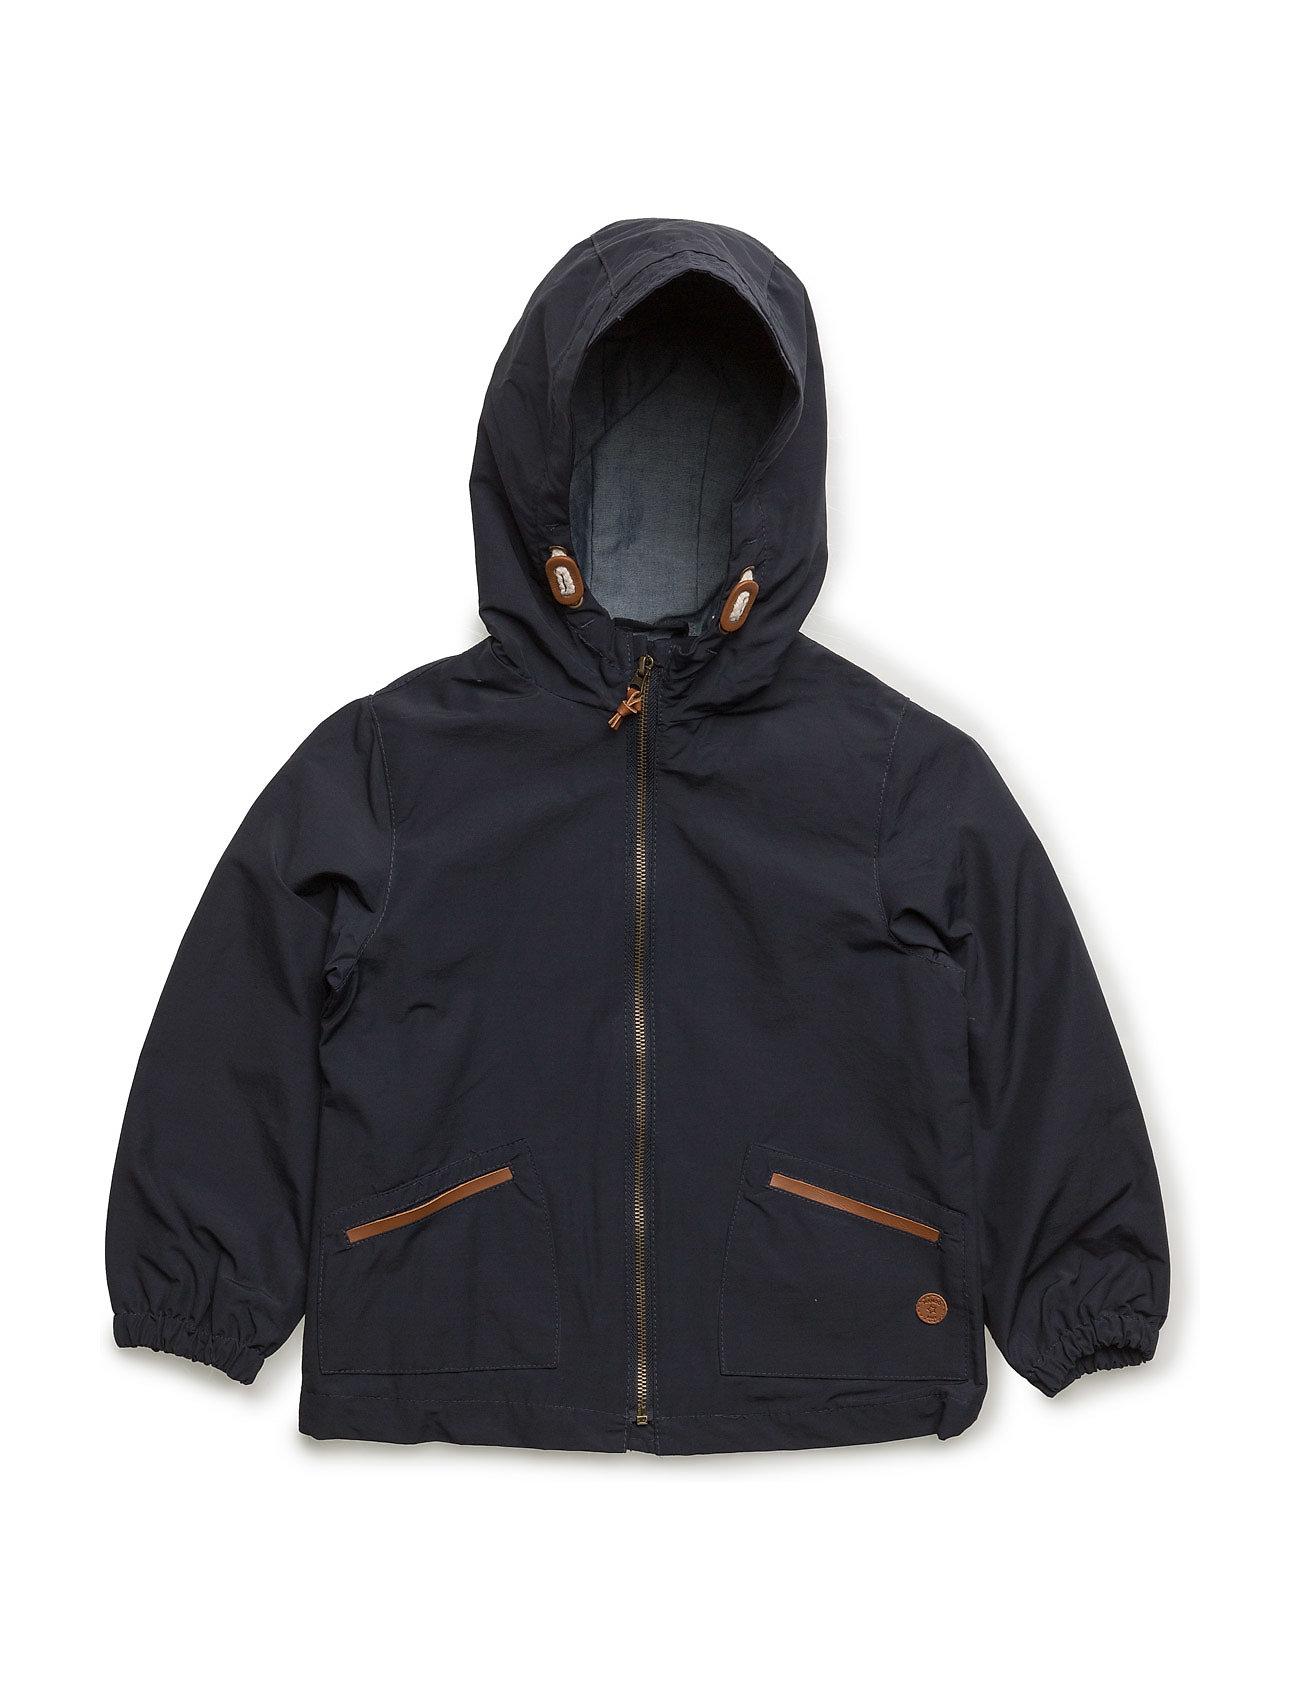 Cotton Hooded Coat Mango Kids Overtøj til Drenge i Navy blå